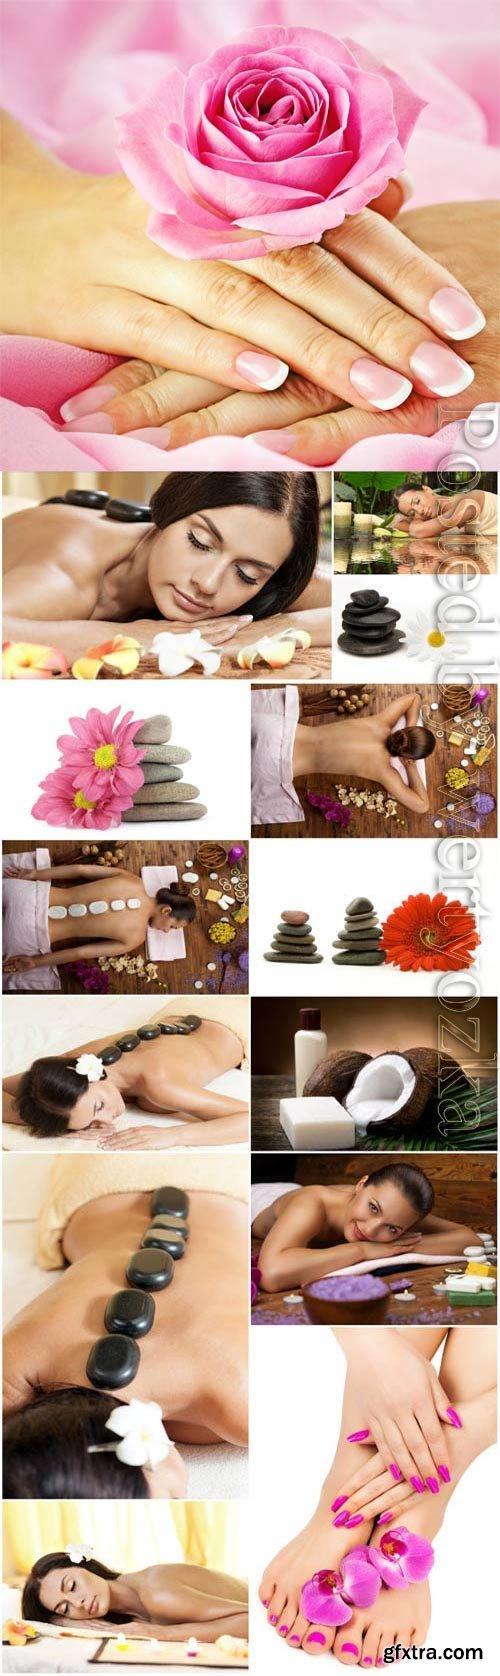 Girls on spa treatments stock photo